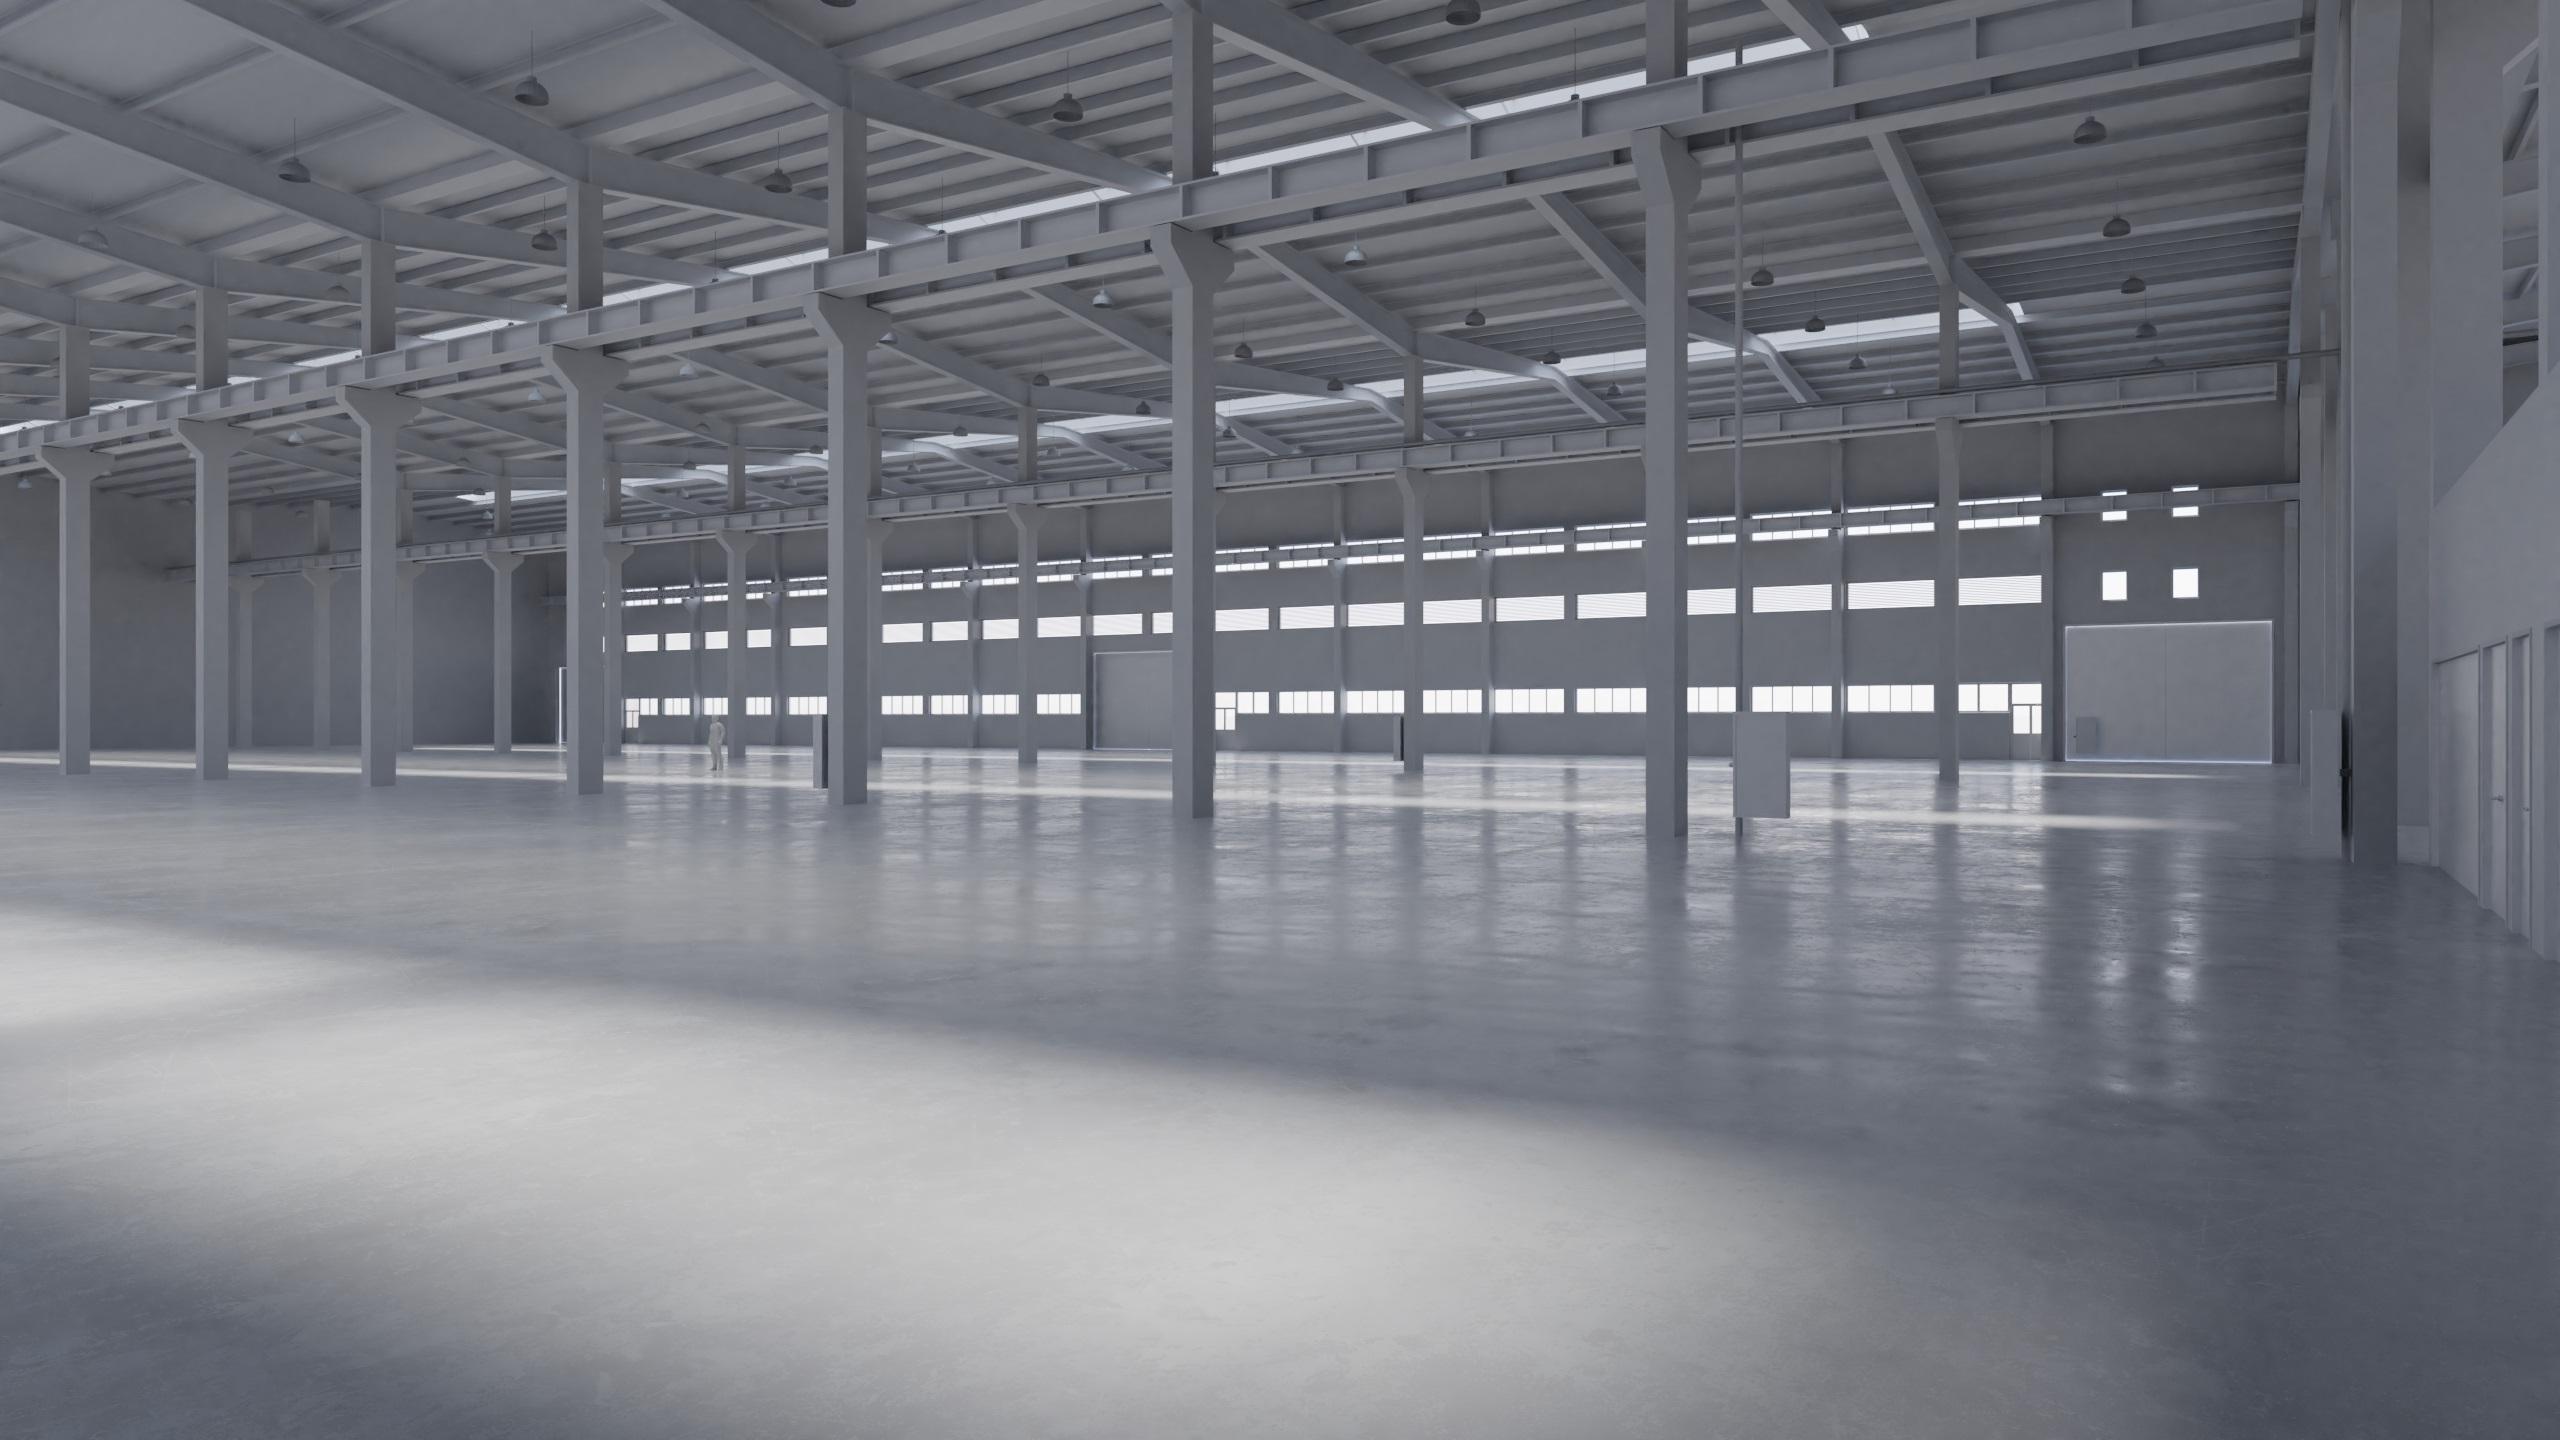 Factory Hall Interior 5 by Pytorator  3DOcean